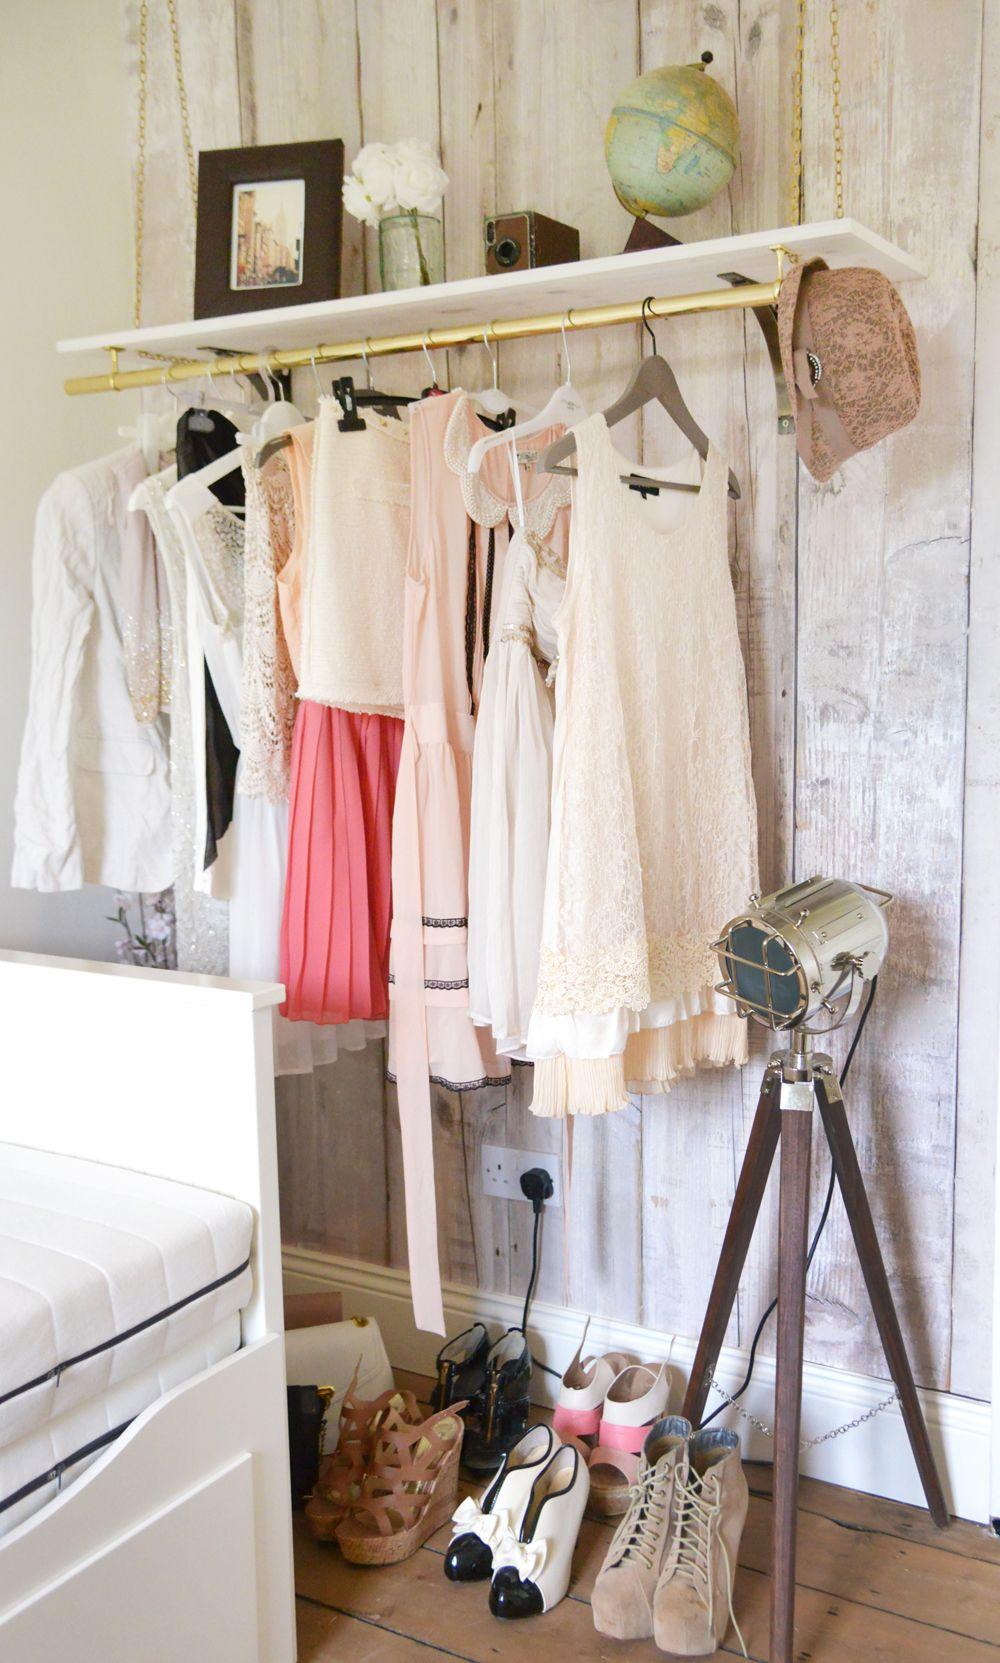 Hanging Clothes Rail Fauxwoodwallpaper Vintageglobe